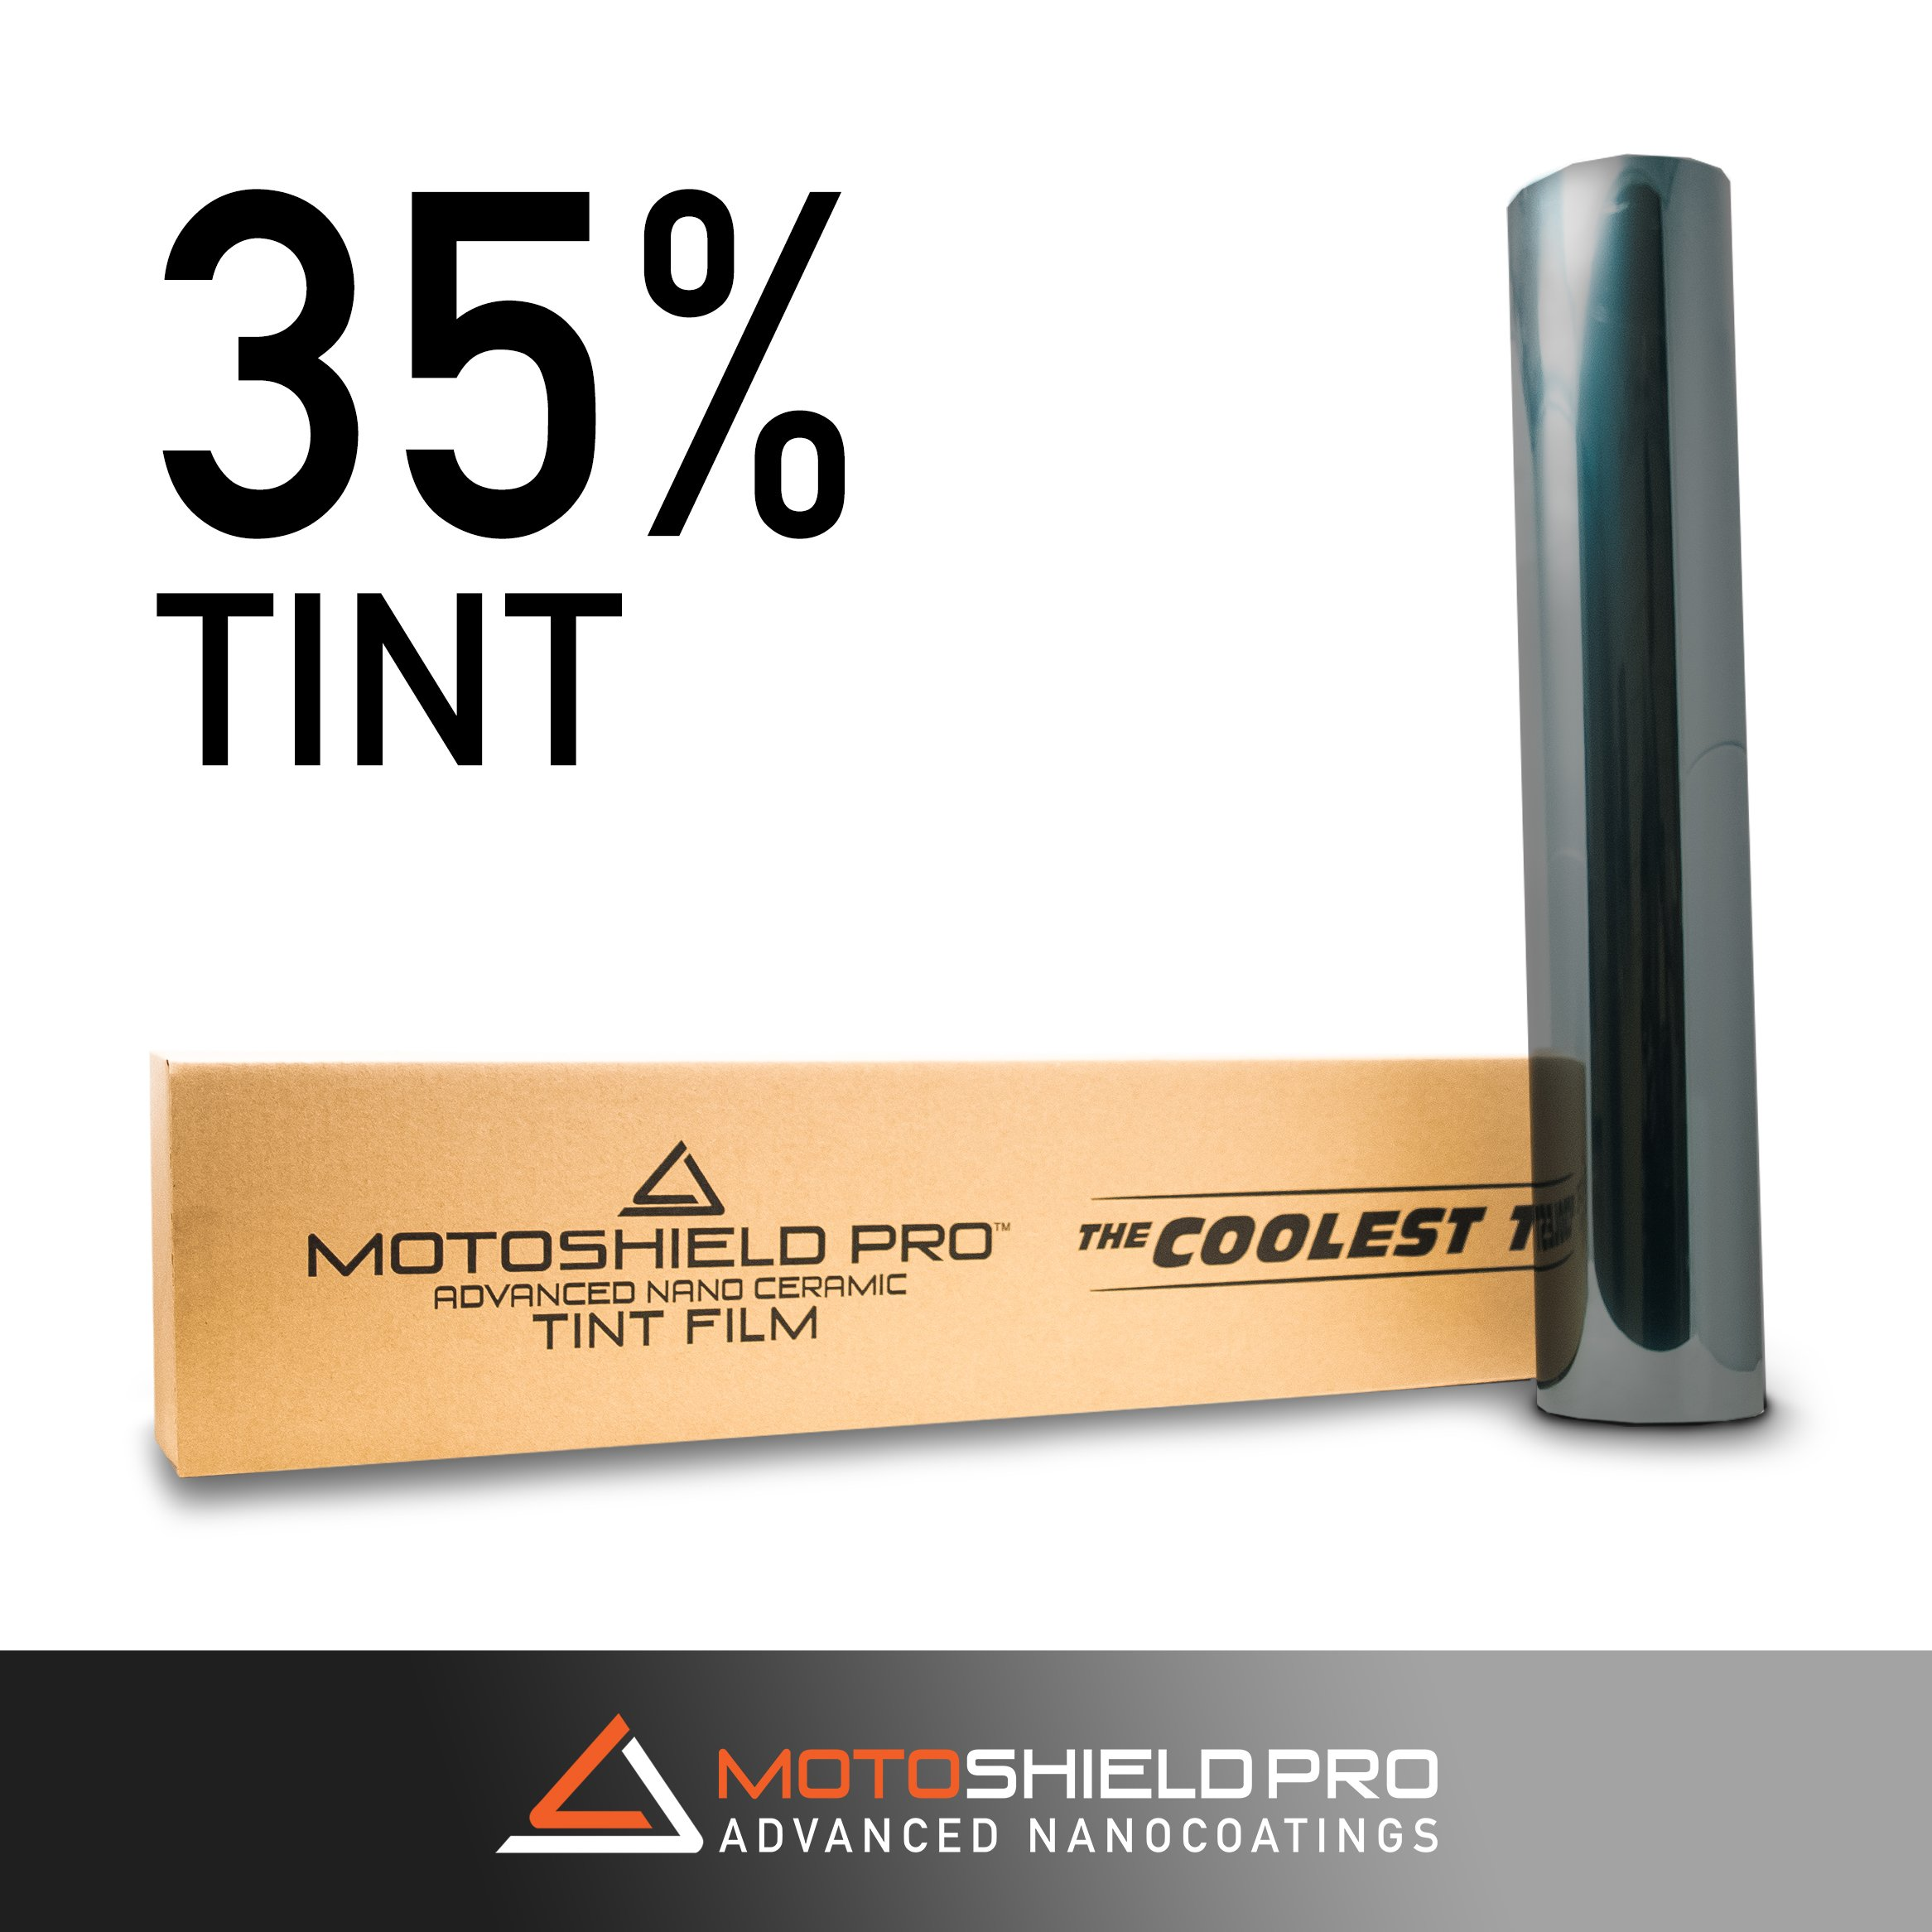 MotoShield Pro Nano Ceramic Tint Film [Blocks Up to 99% of UV/IRR Rays] 20'' x 100' Window Tint Roll - 35%